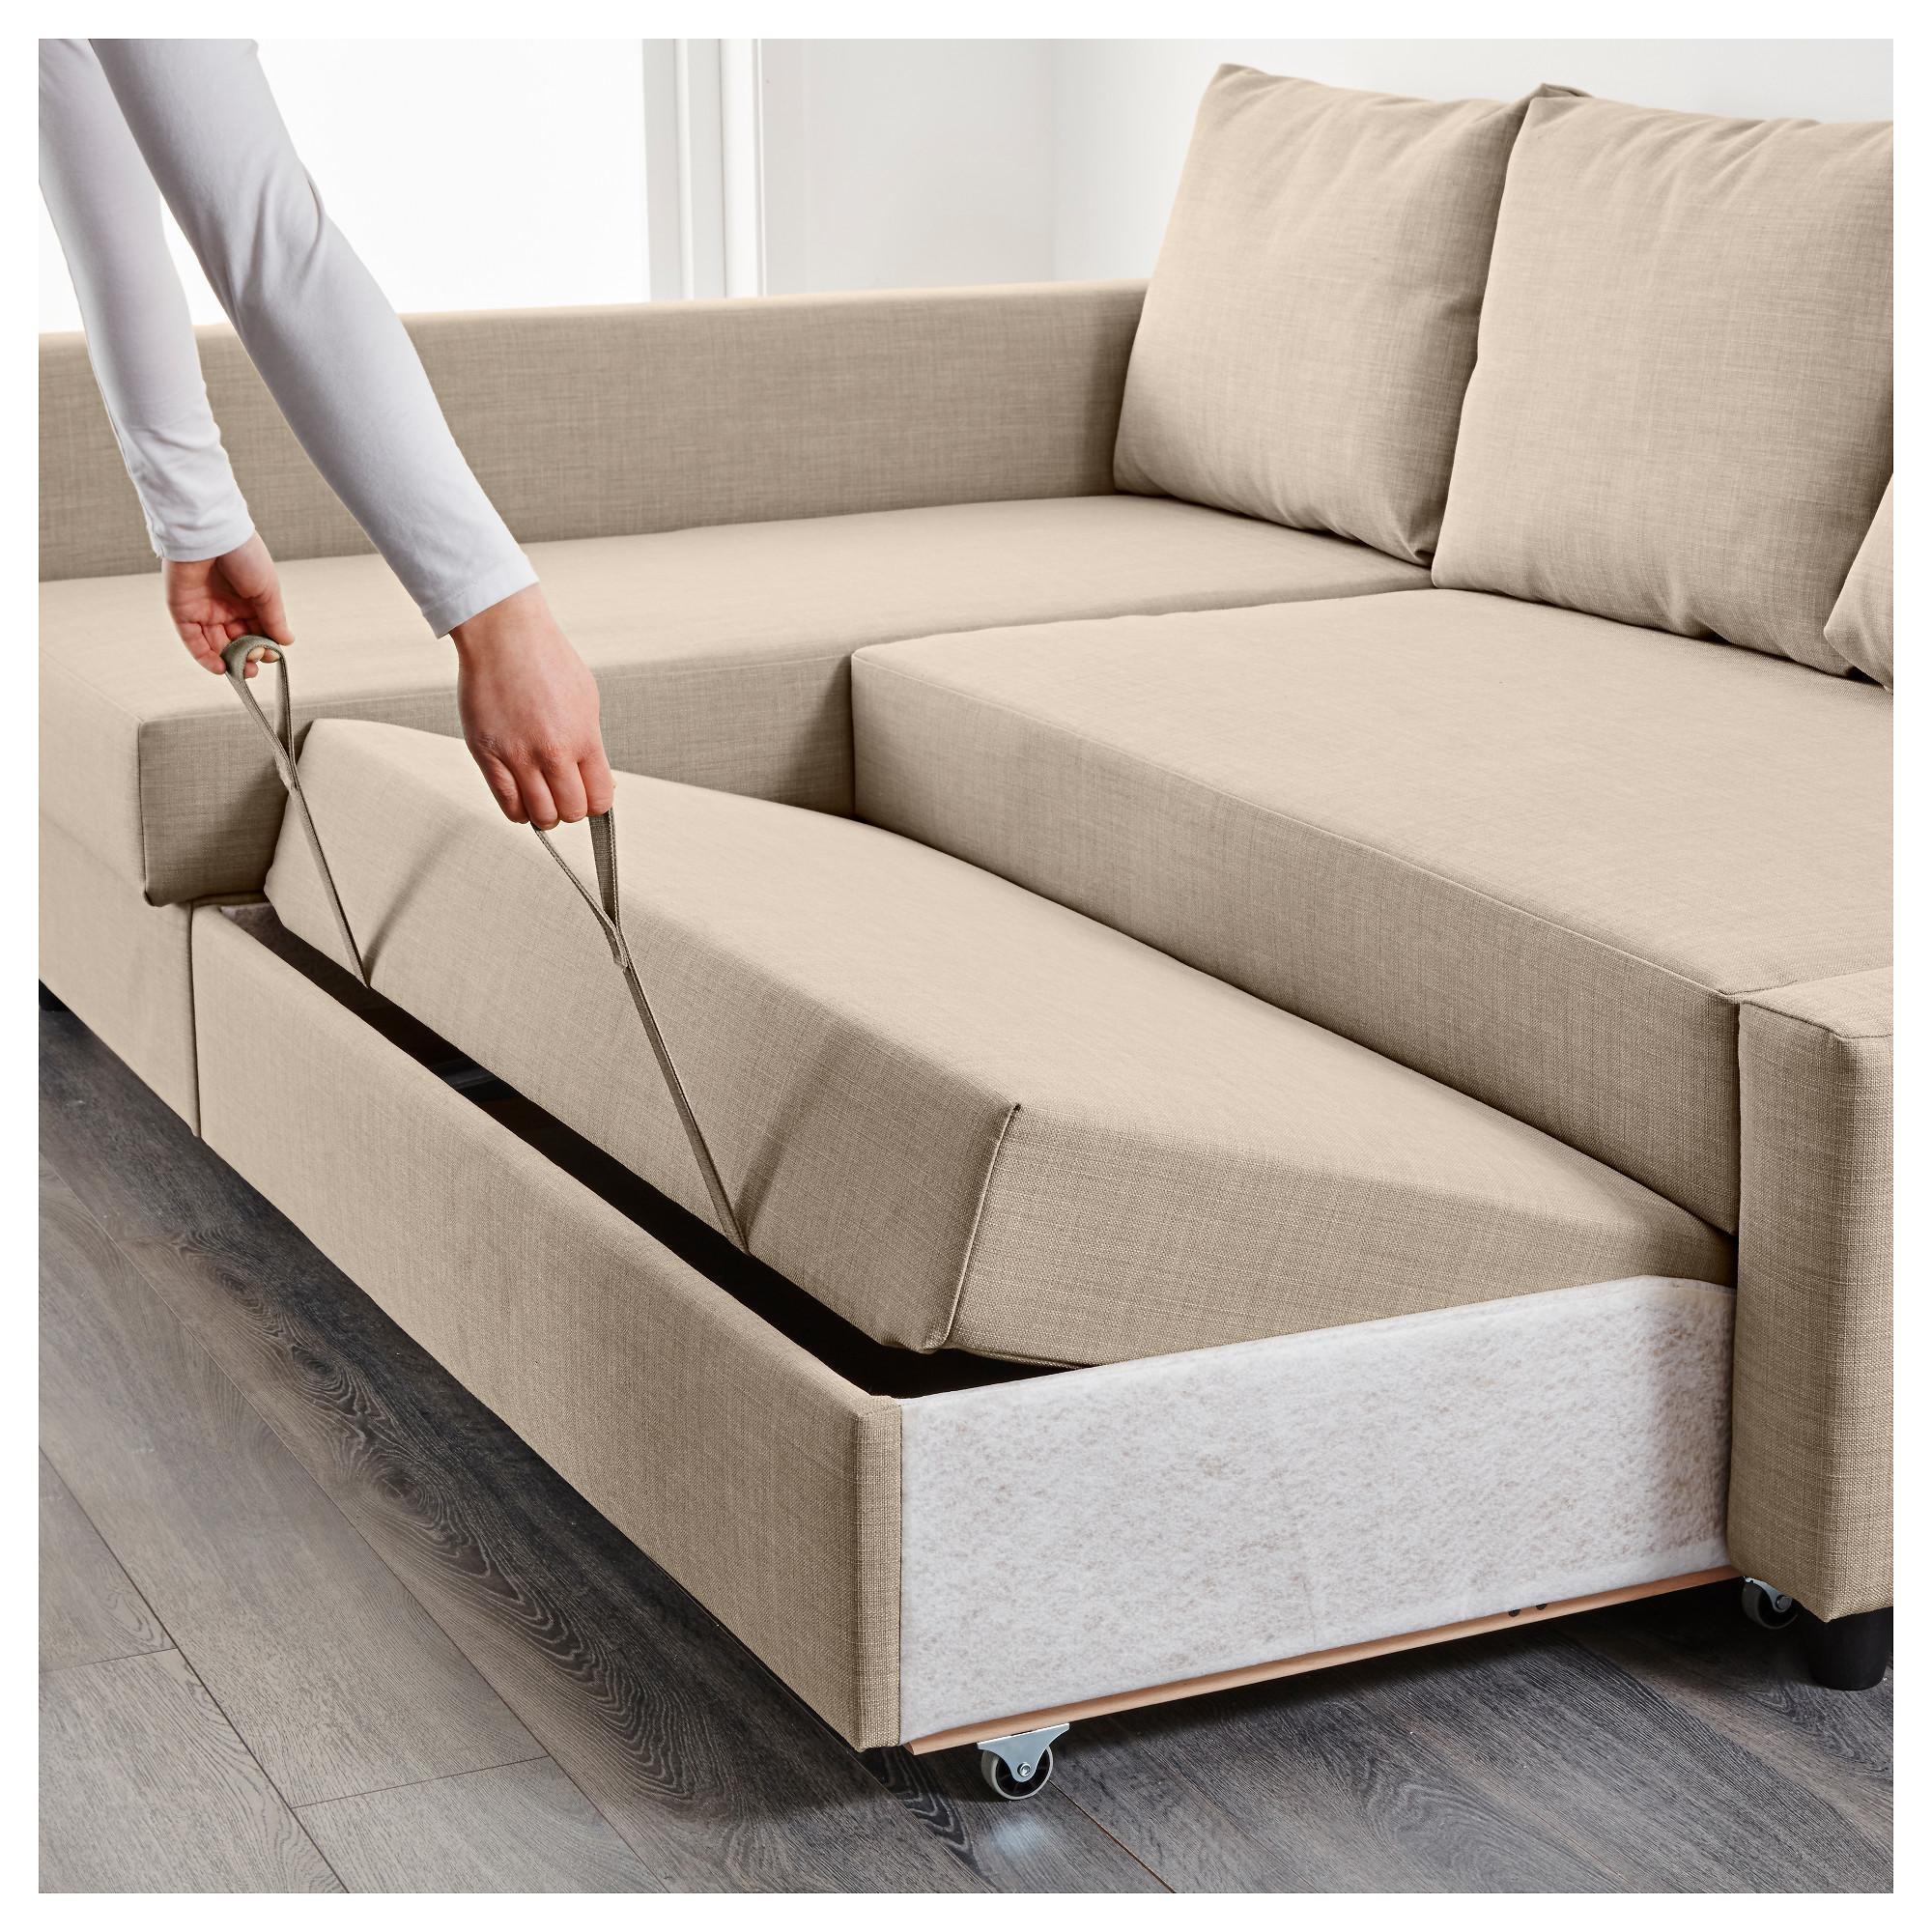 Friheten Corner Sofa Bed With Storage Skiftebo Beige – Ikea For Ikea Corner Sofa Bed With Storage (Image 5 of 20)